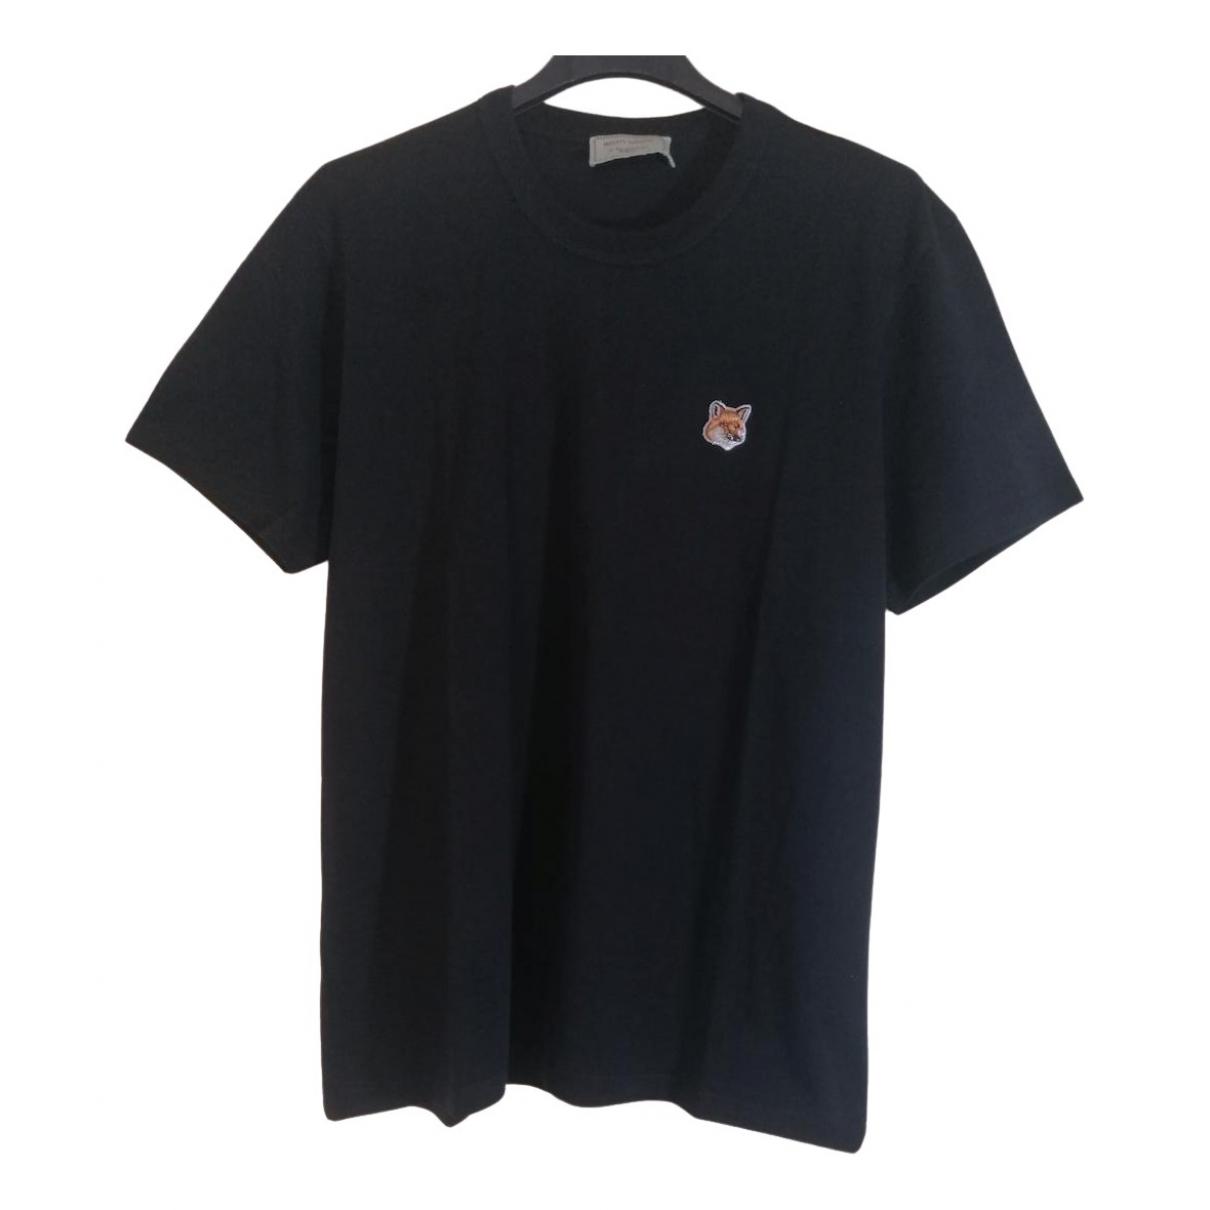 Maison Kitsune \N T-Shirts in  Schwarz Baumwolle